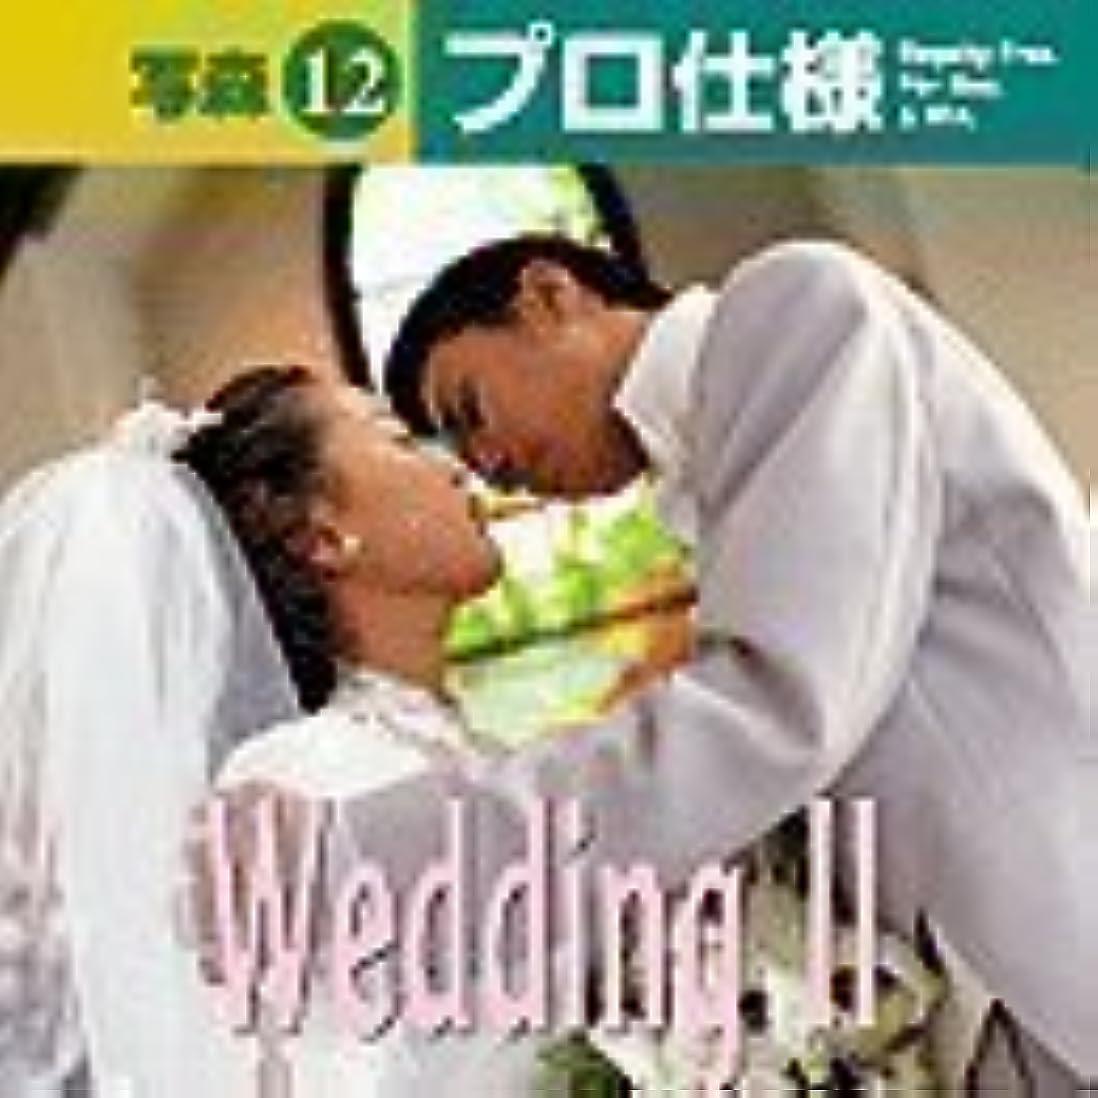 虐殺喪交通渋滞写森プロ仕様 Vol.12 Wedding 2